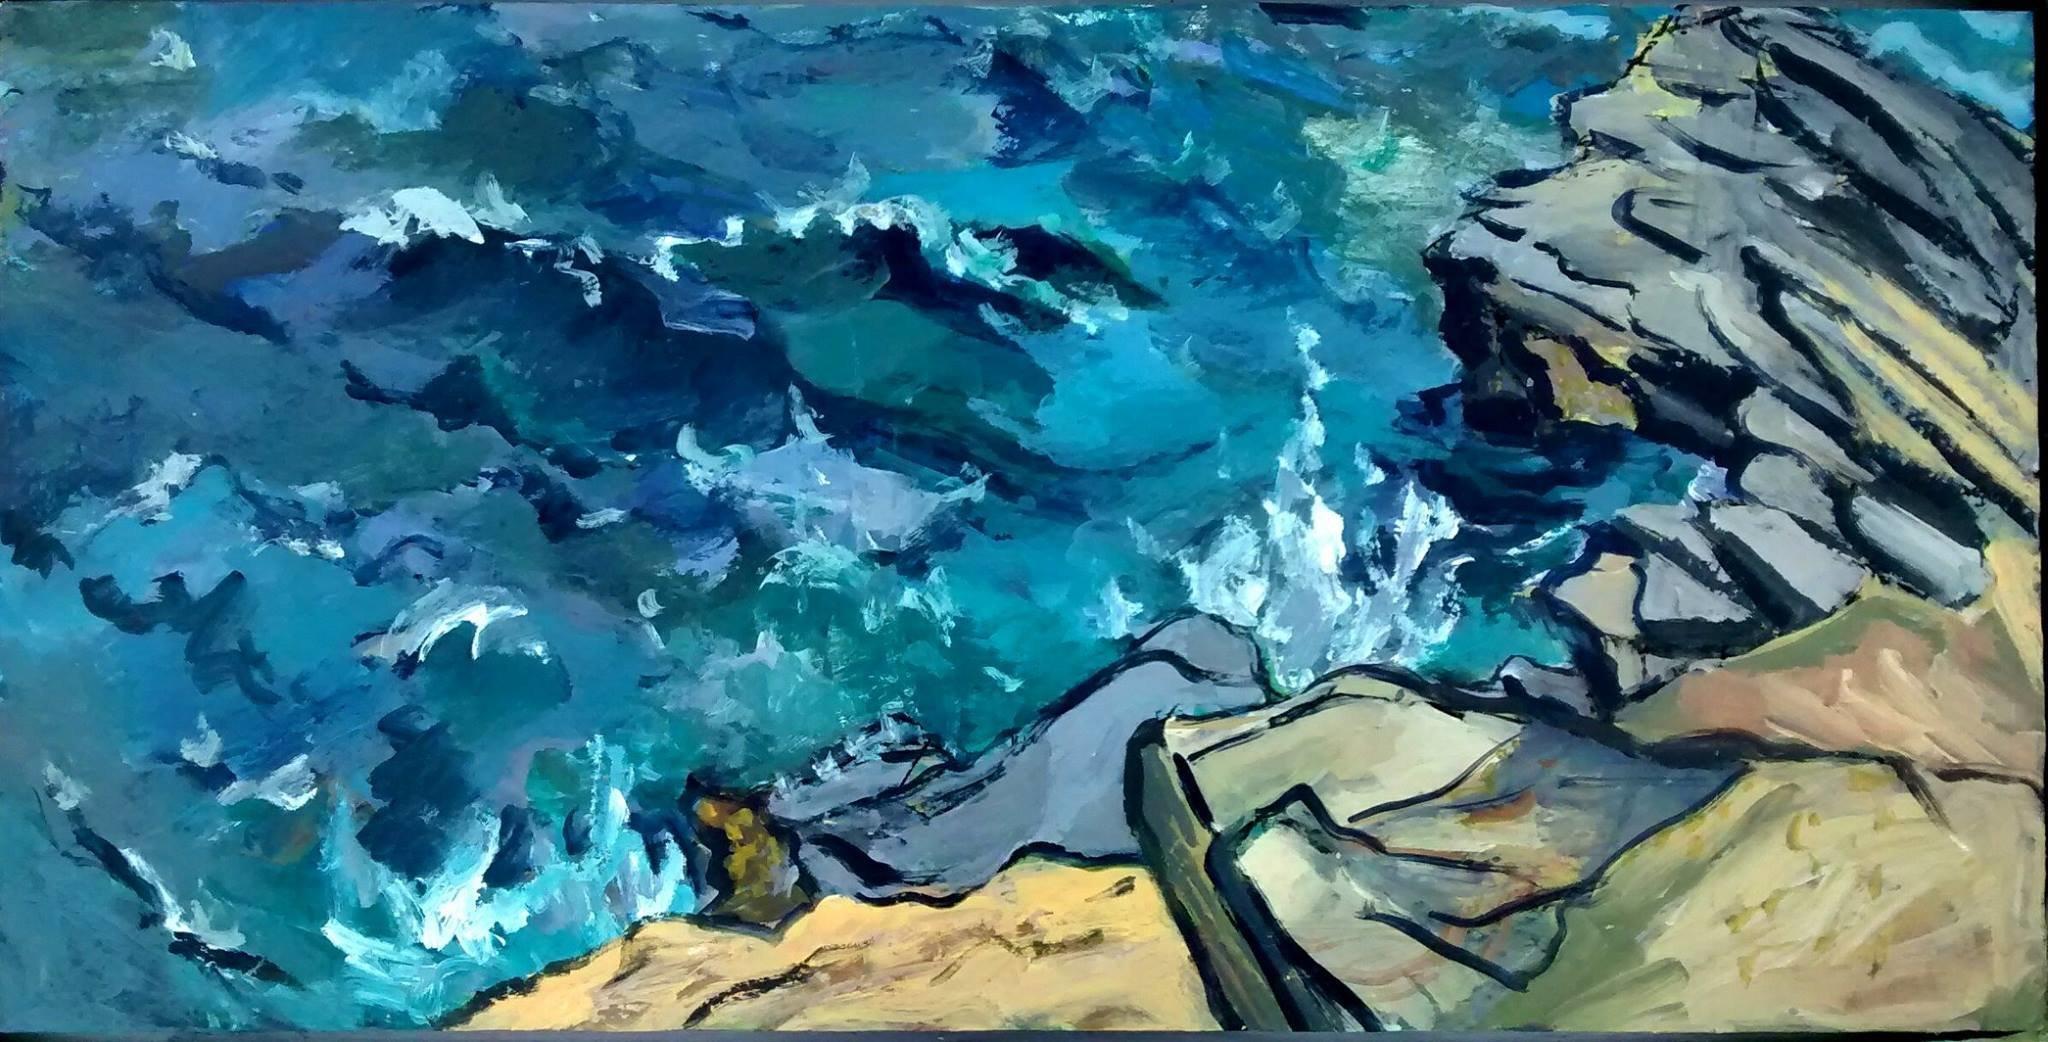 seaocean.jpg